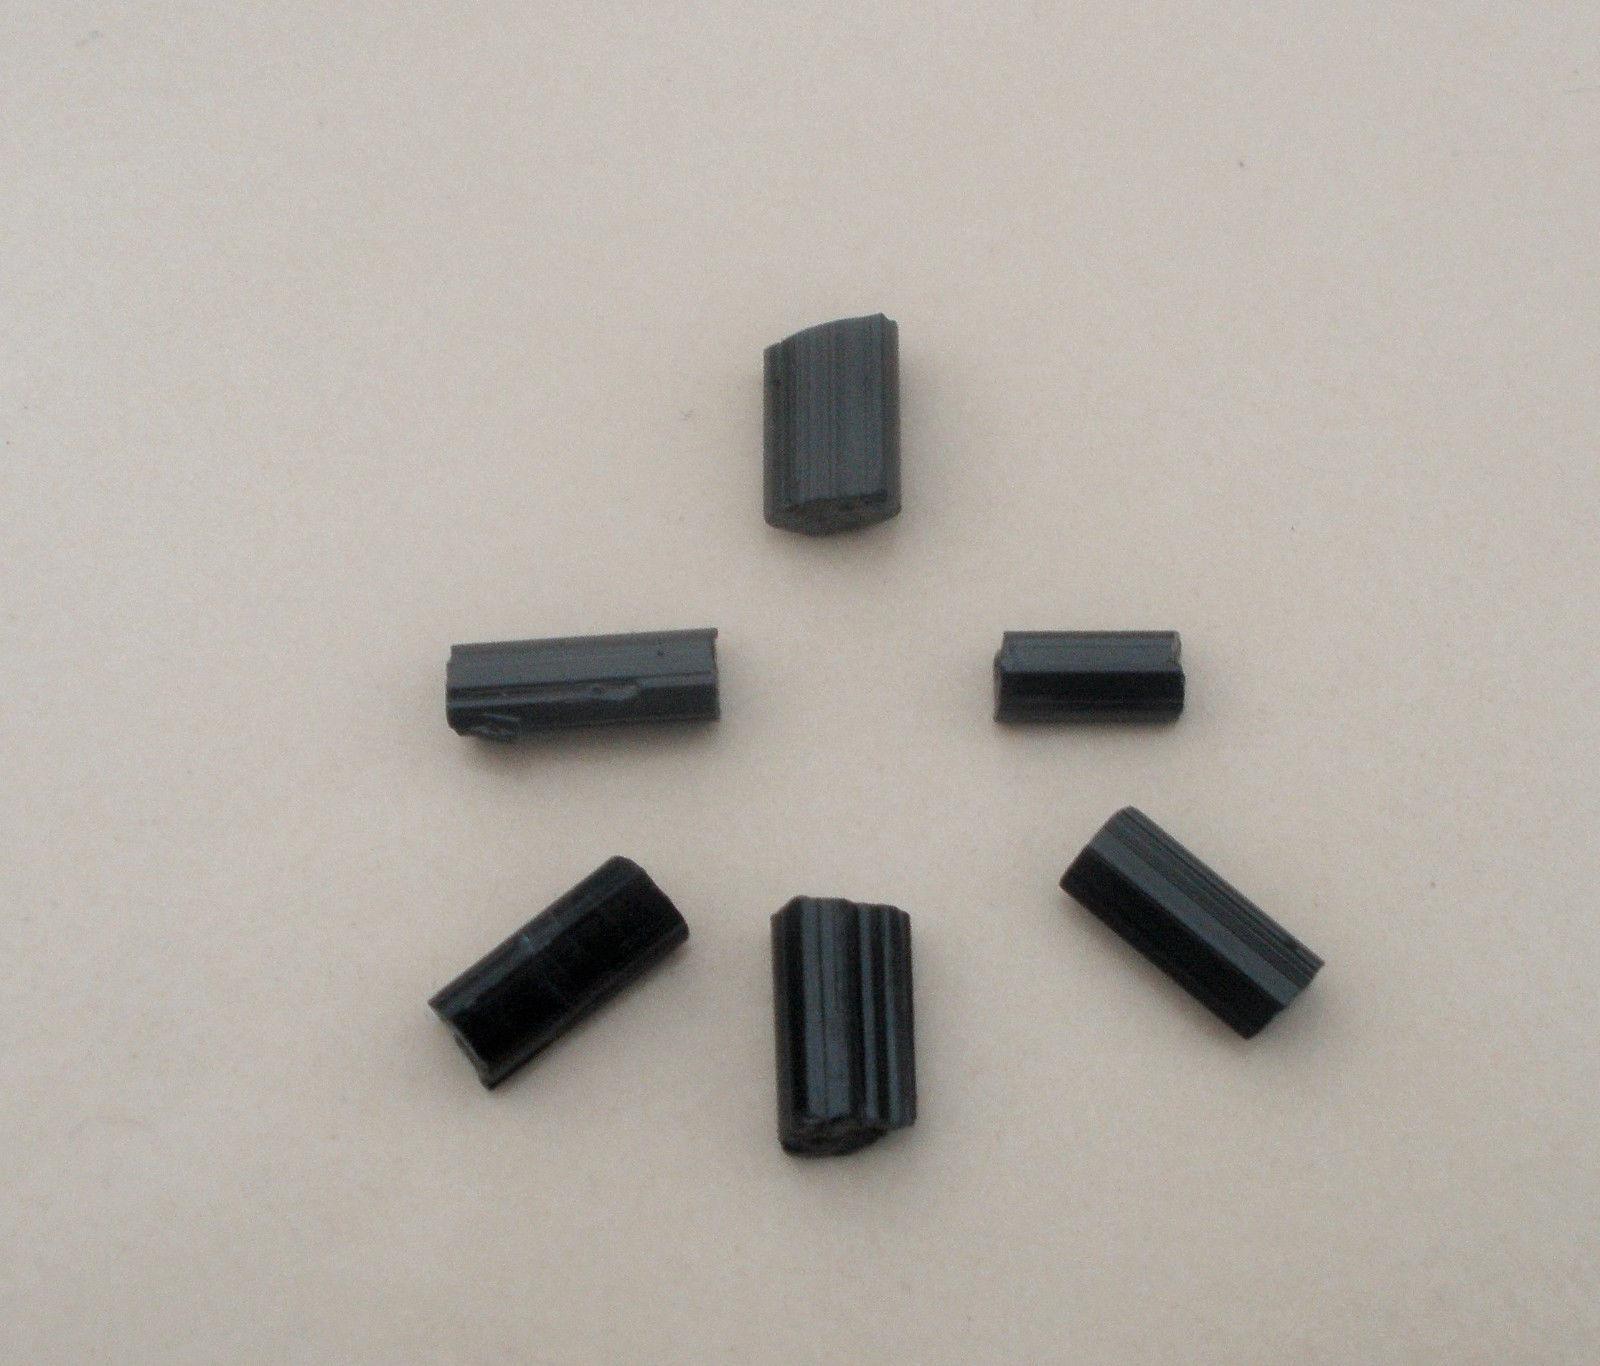 6 Black Tourmaline crystal rough gems 9mm to 12mm each